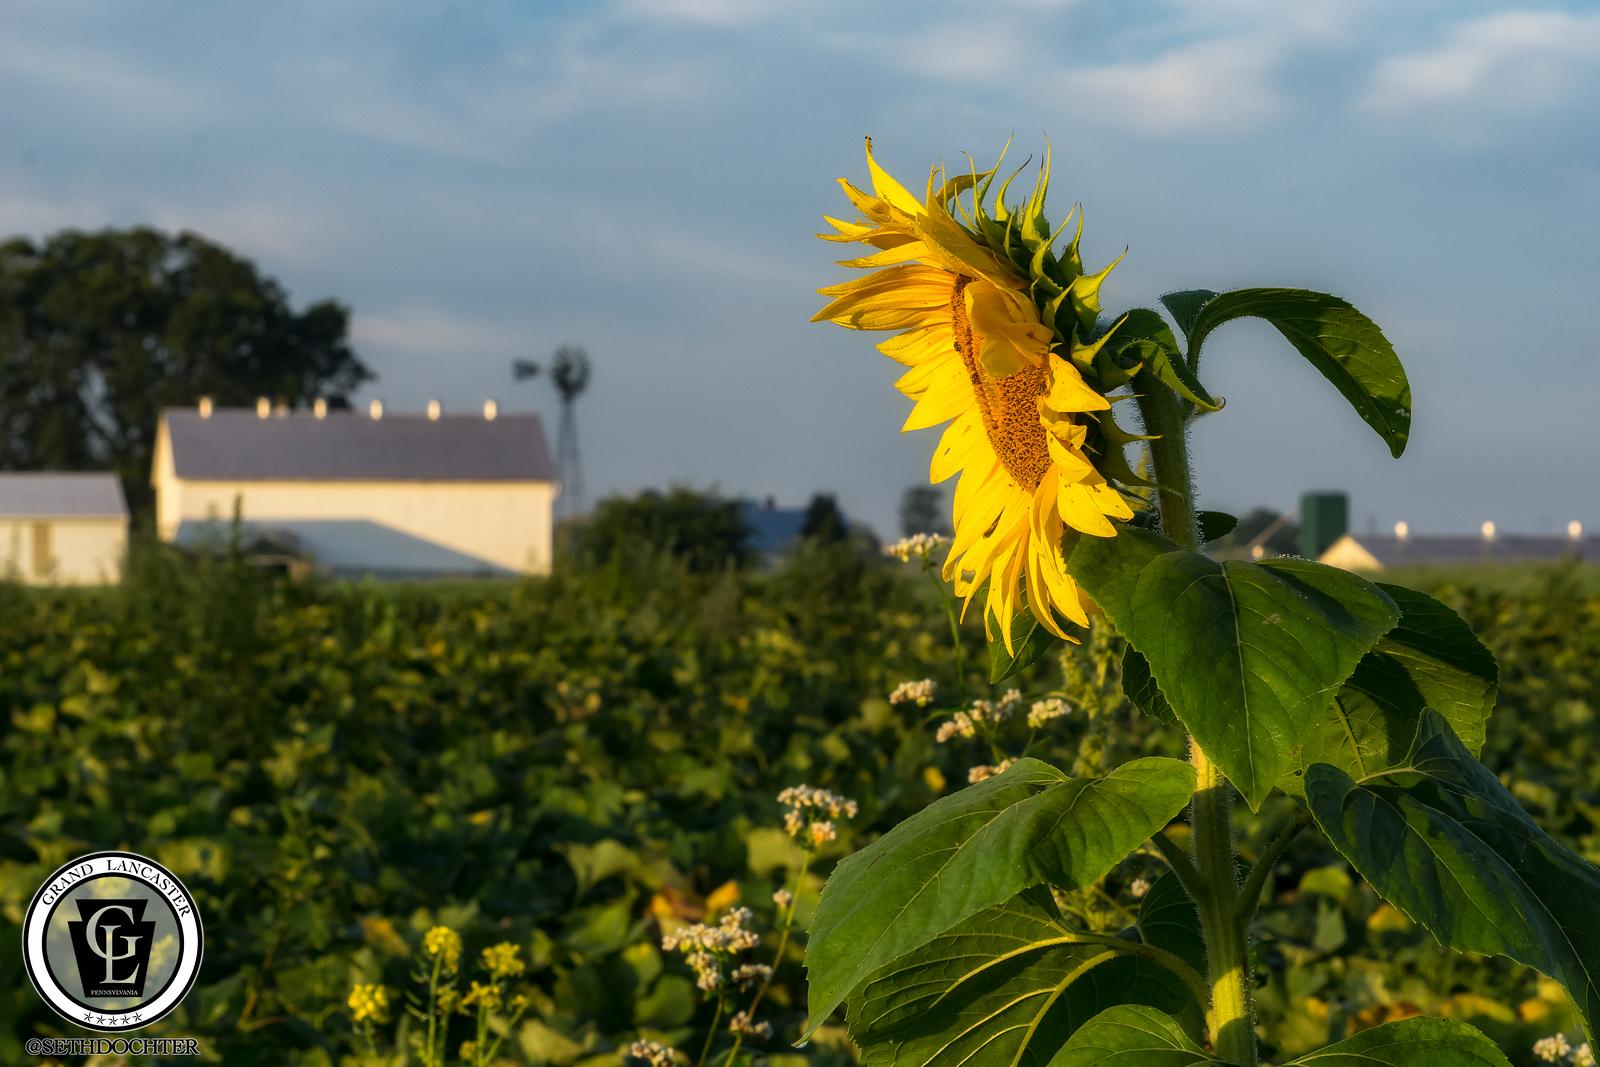 1330 - Sunflowers - Sunrise Flower Farm Amsterdam Road